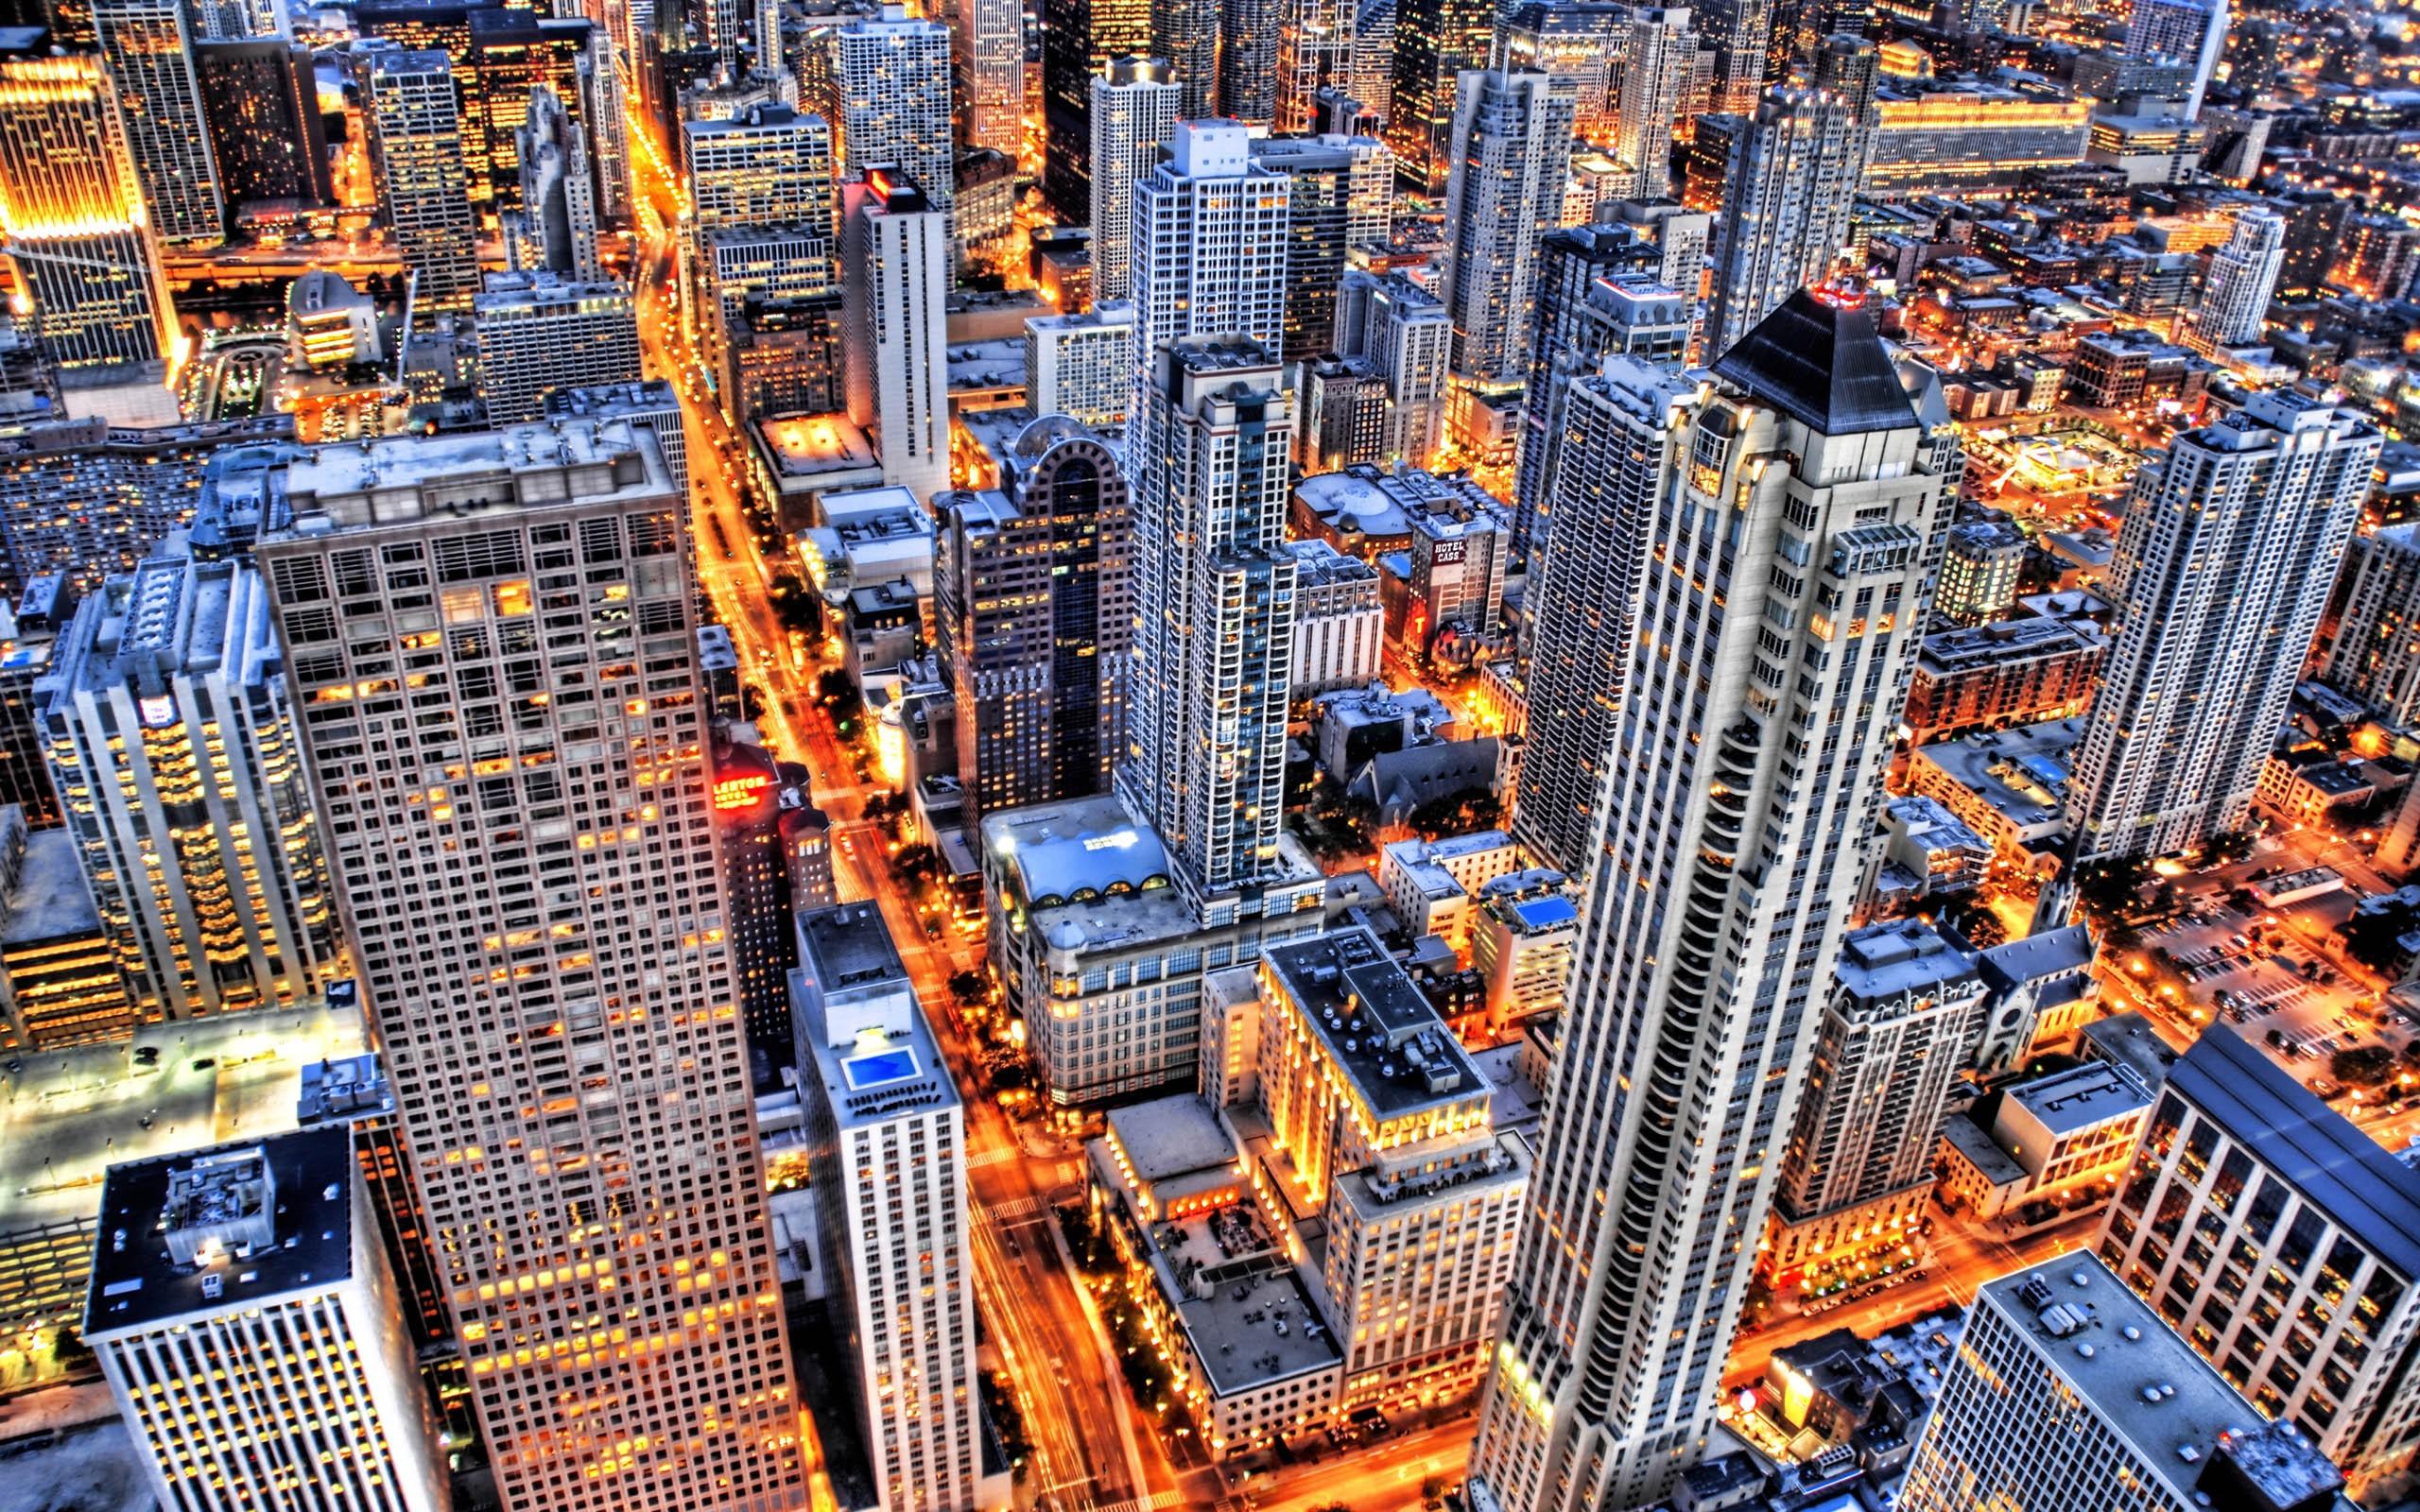 Hdr City Wallpaper 2560x1600